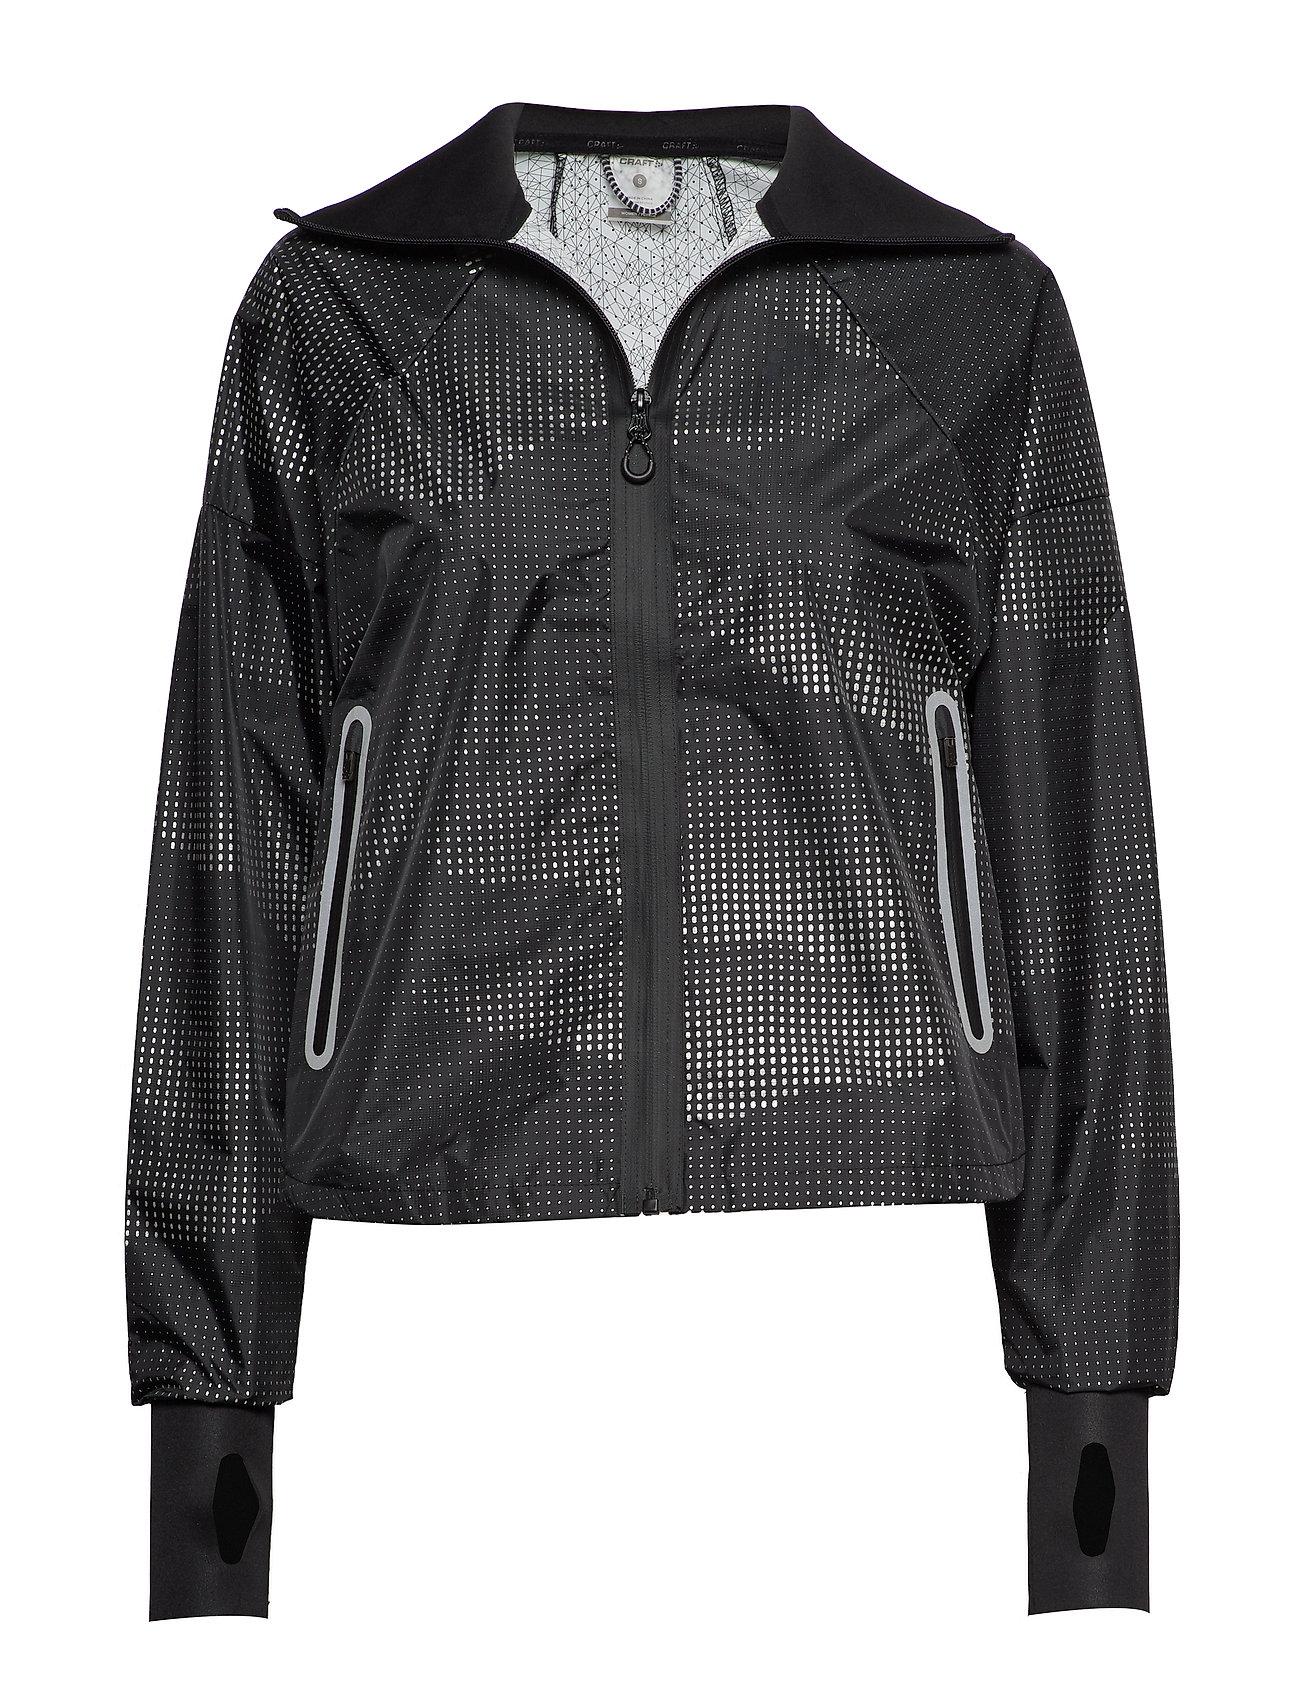 Craft NORDIC LIGHT JKT W - BLACK